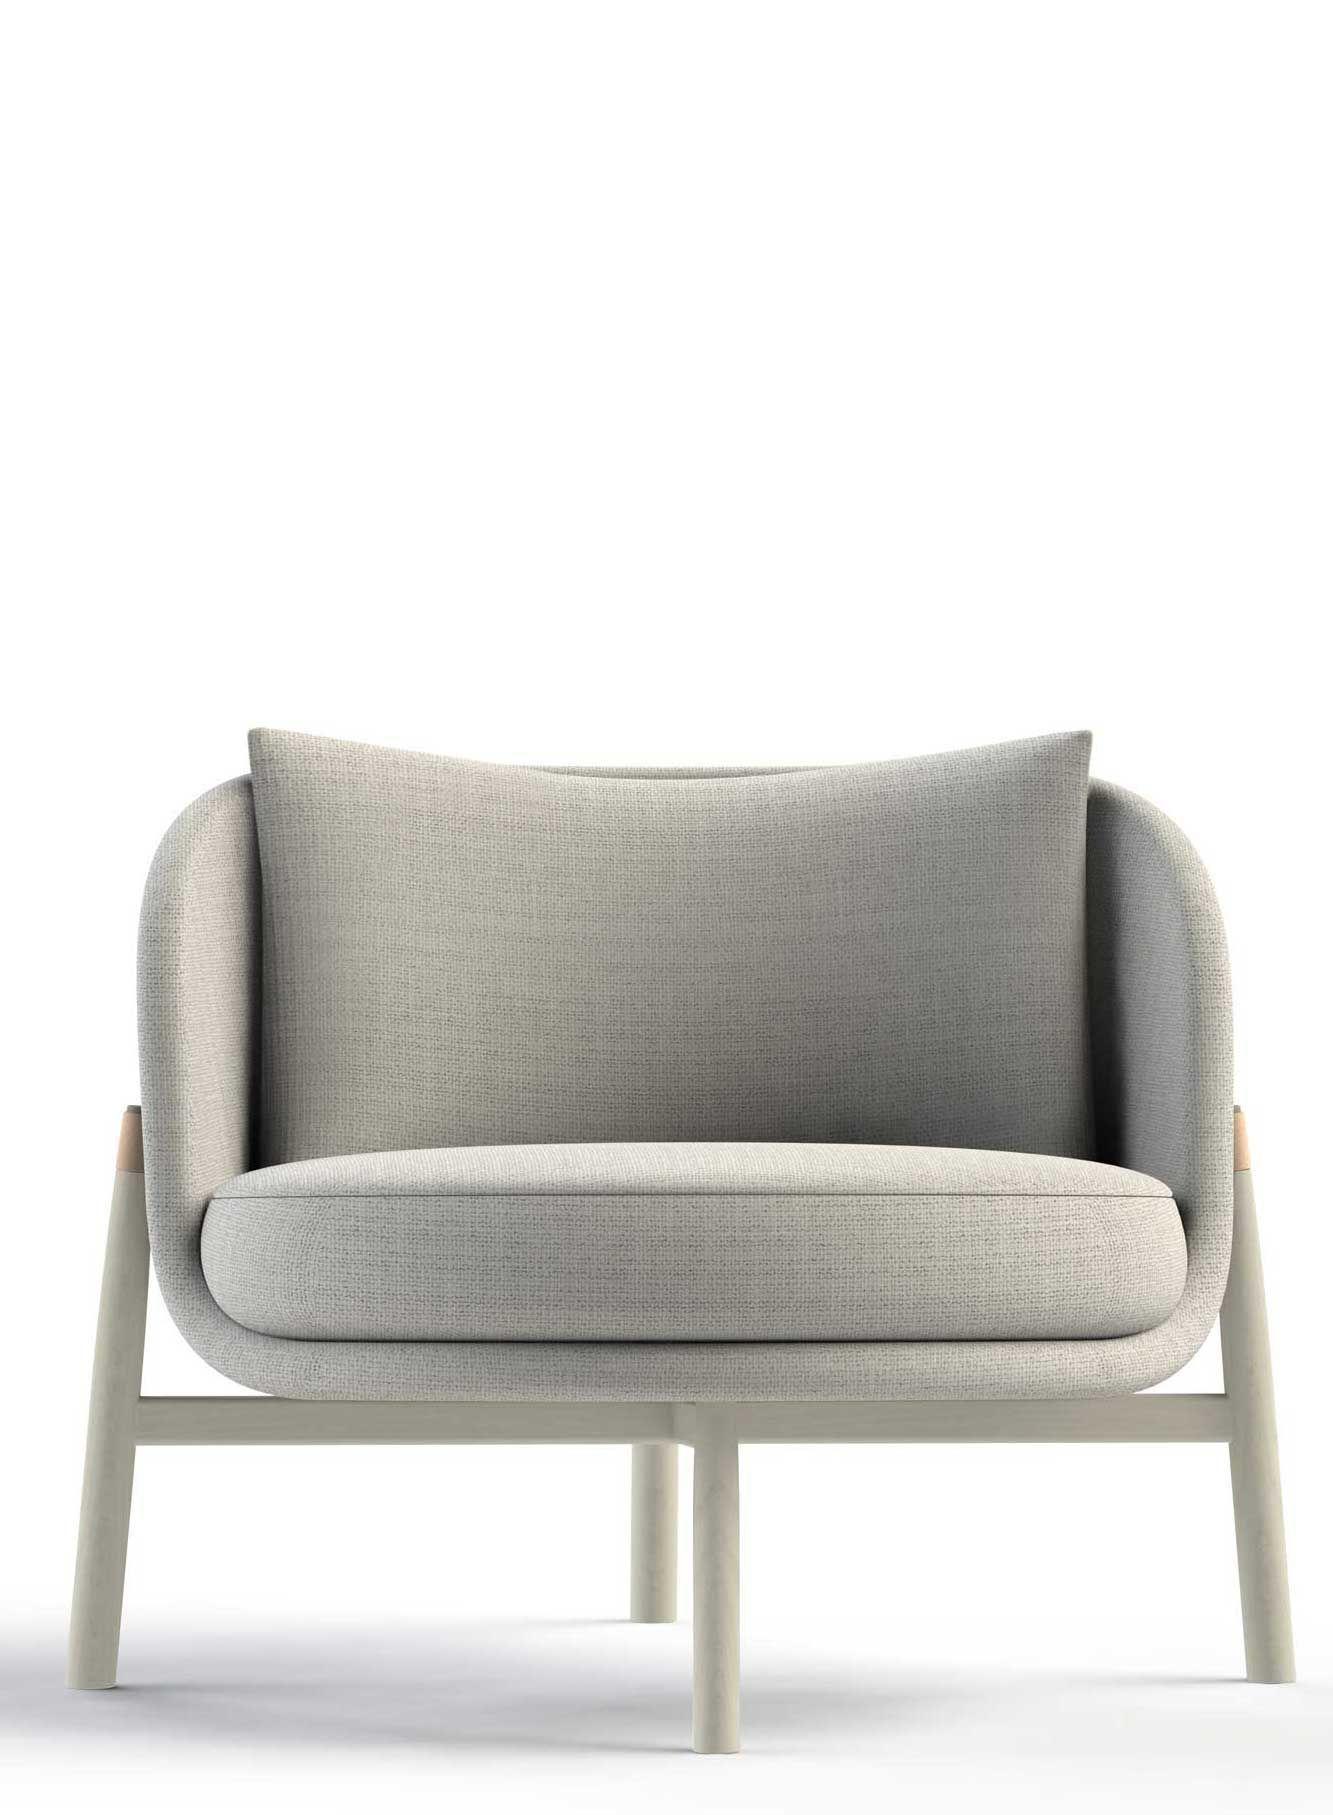 Yabu Pushelberg For Linteloo Interior Design Chair Chair Design Sofa Design